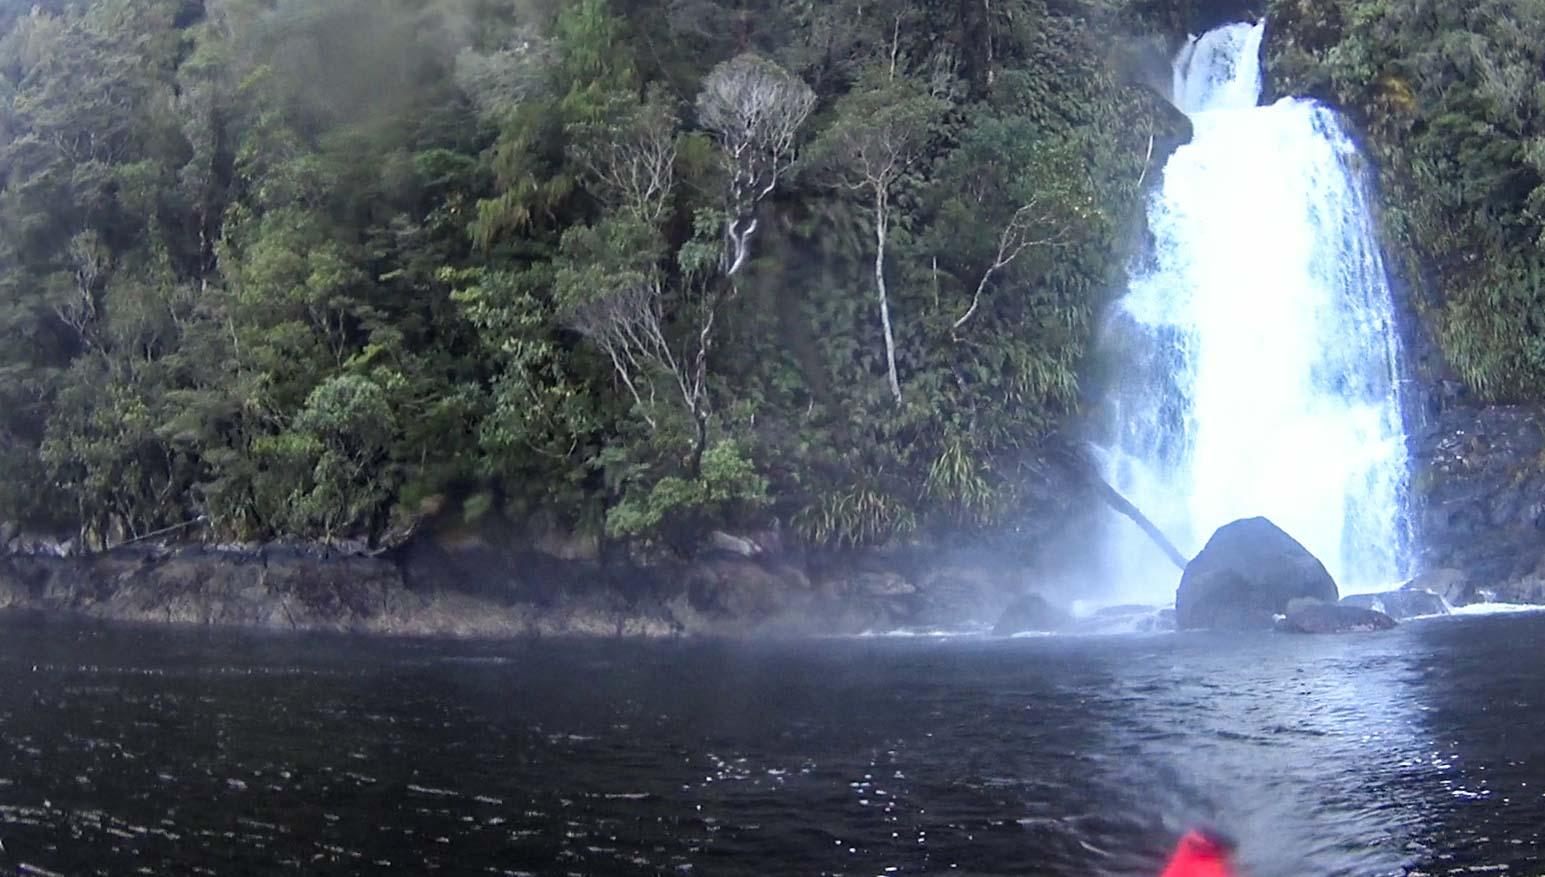 Washing Waterfall